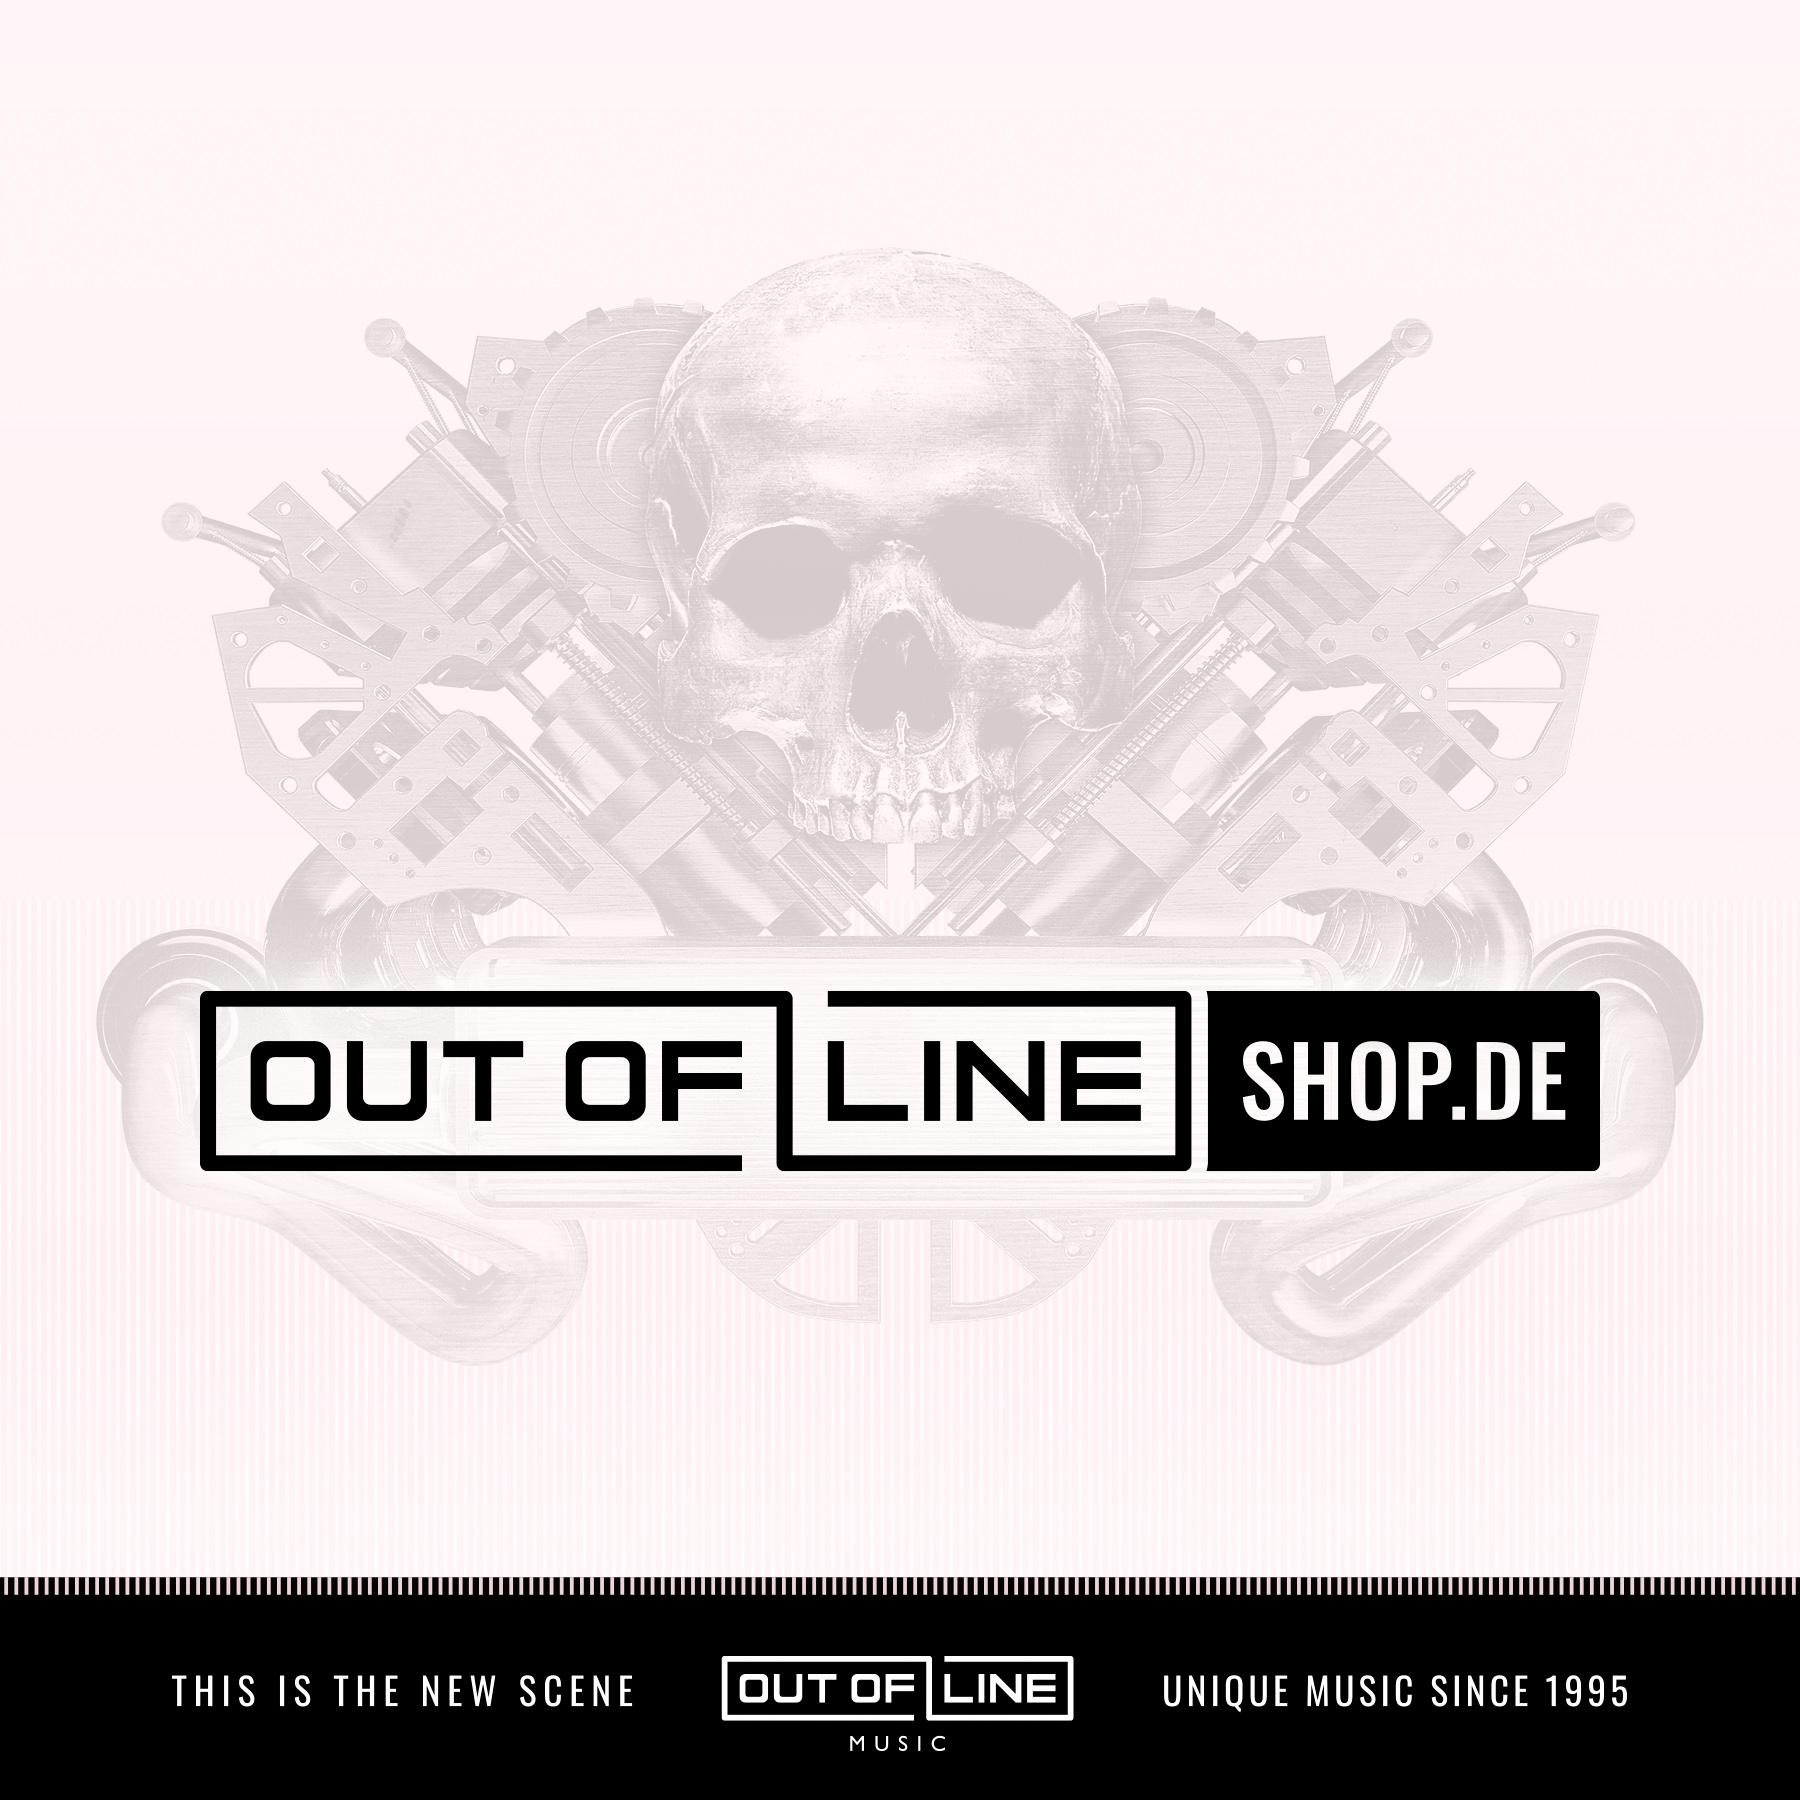 Blutengel - Schrift/Logo (Flügel) - Glow In The Dark - Silikonarmband/Silicone Wrist Band